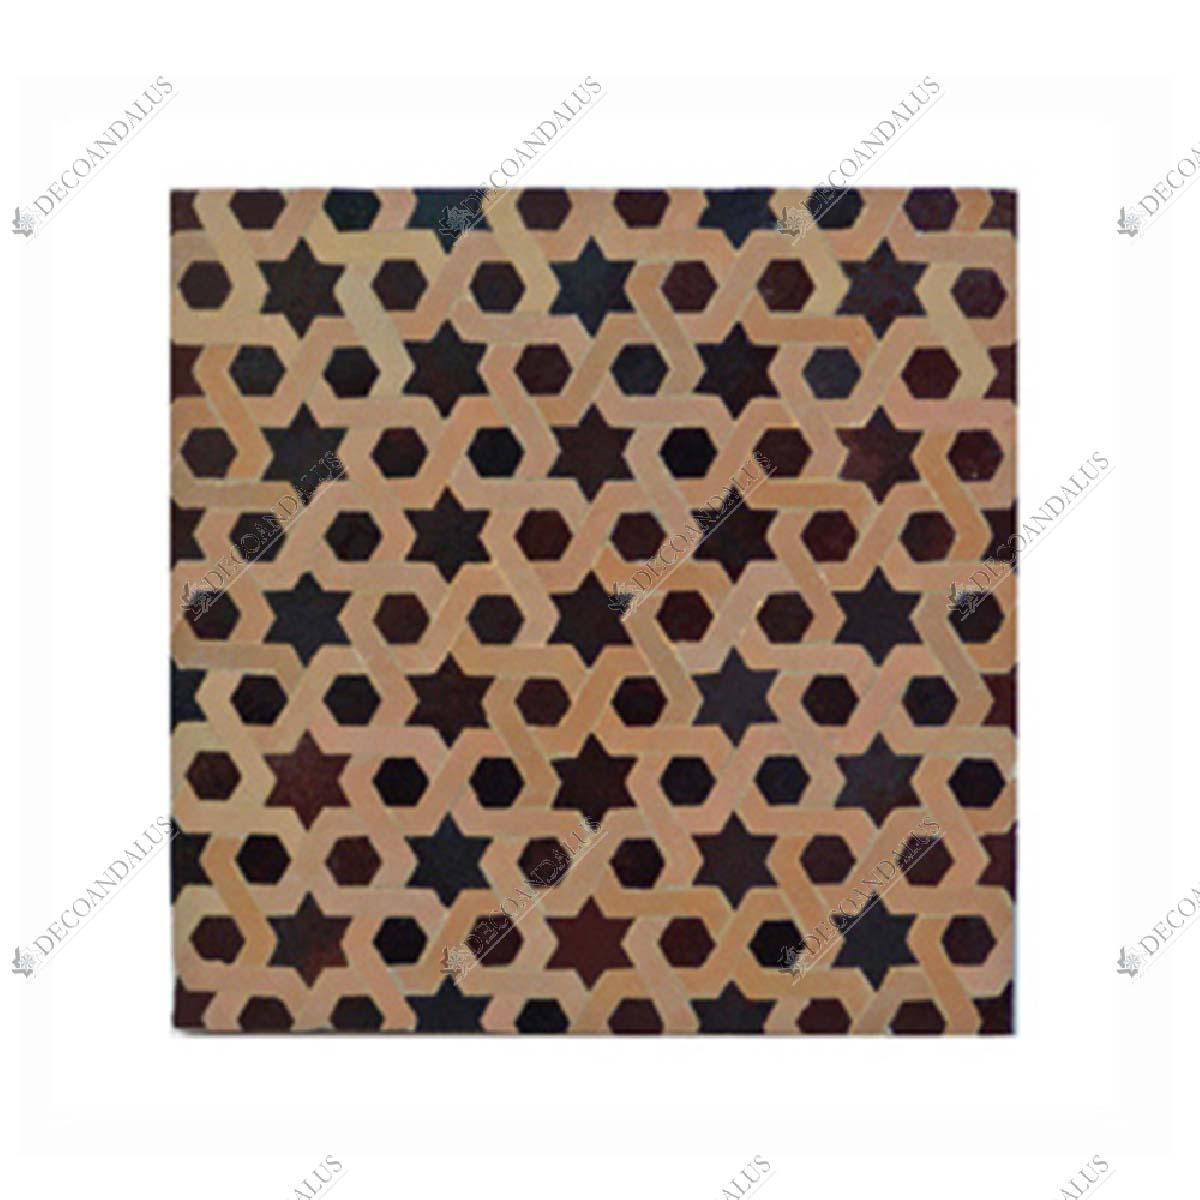 Fondo Mosaico AR.FO.29